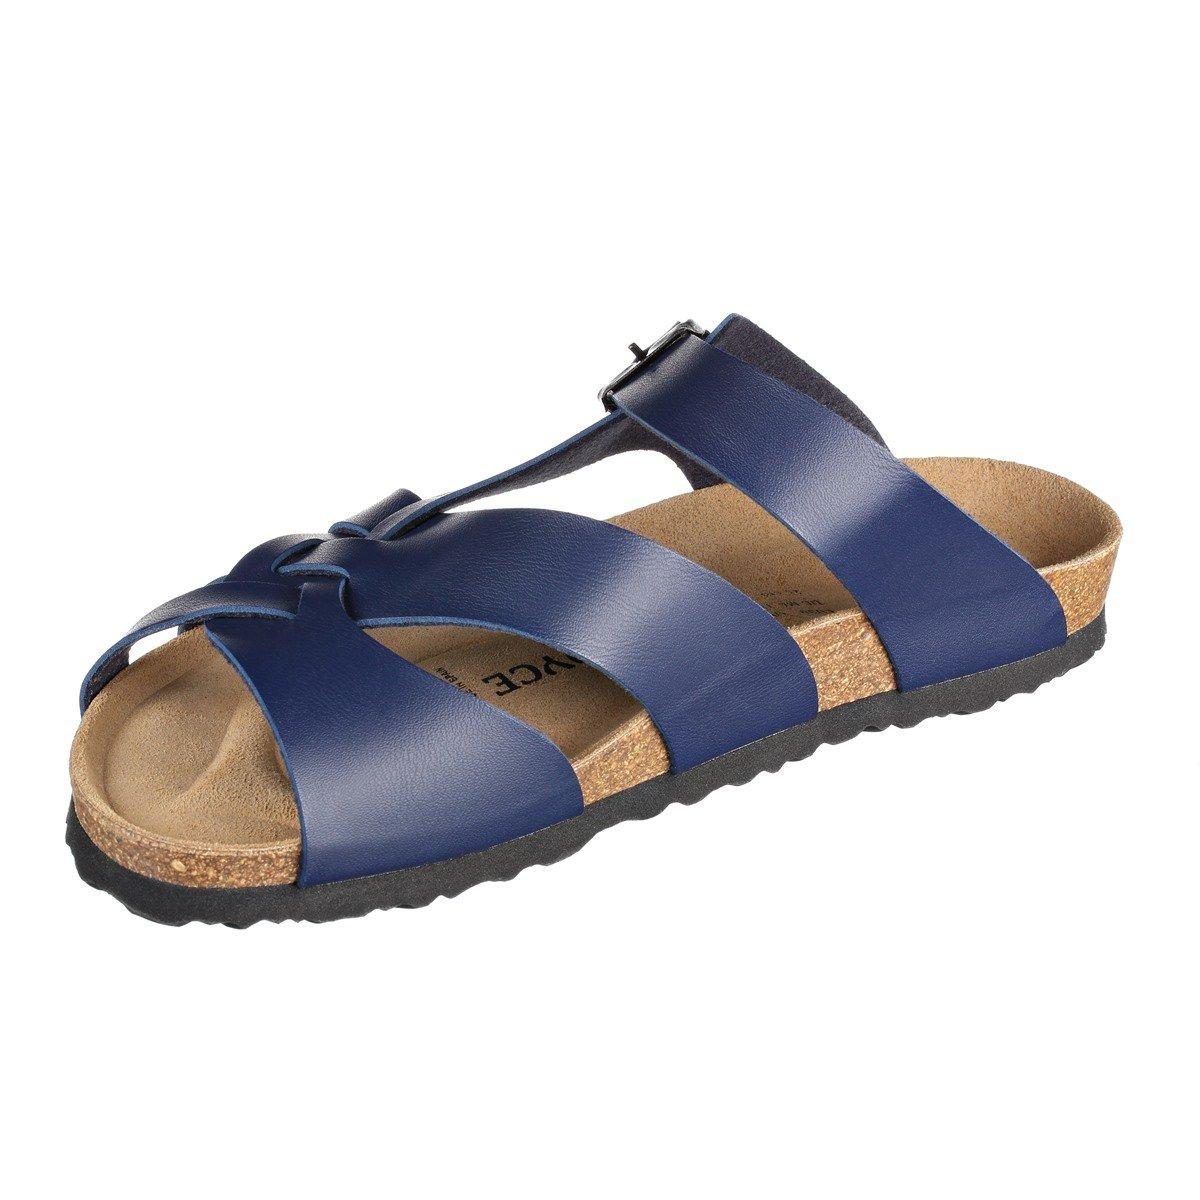 JOE N JOYCE Athen SynSoft Soft-Footbed Blue Size EU 39 Narrow